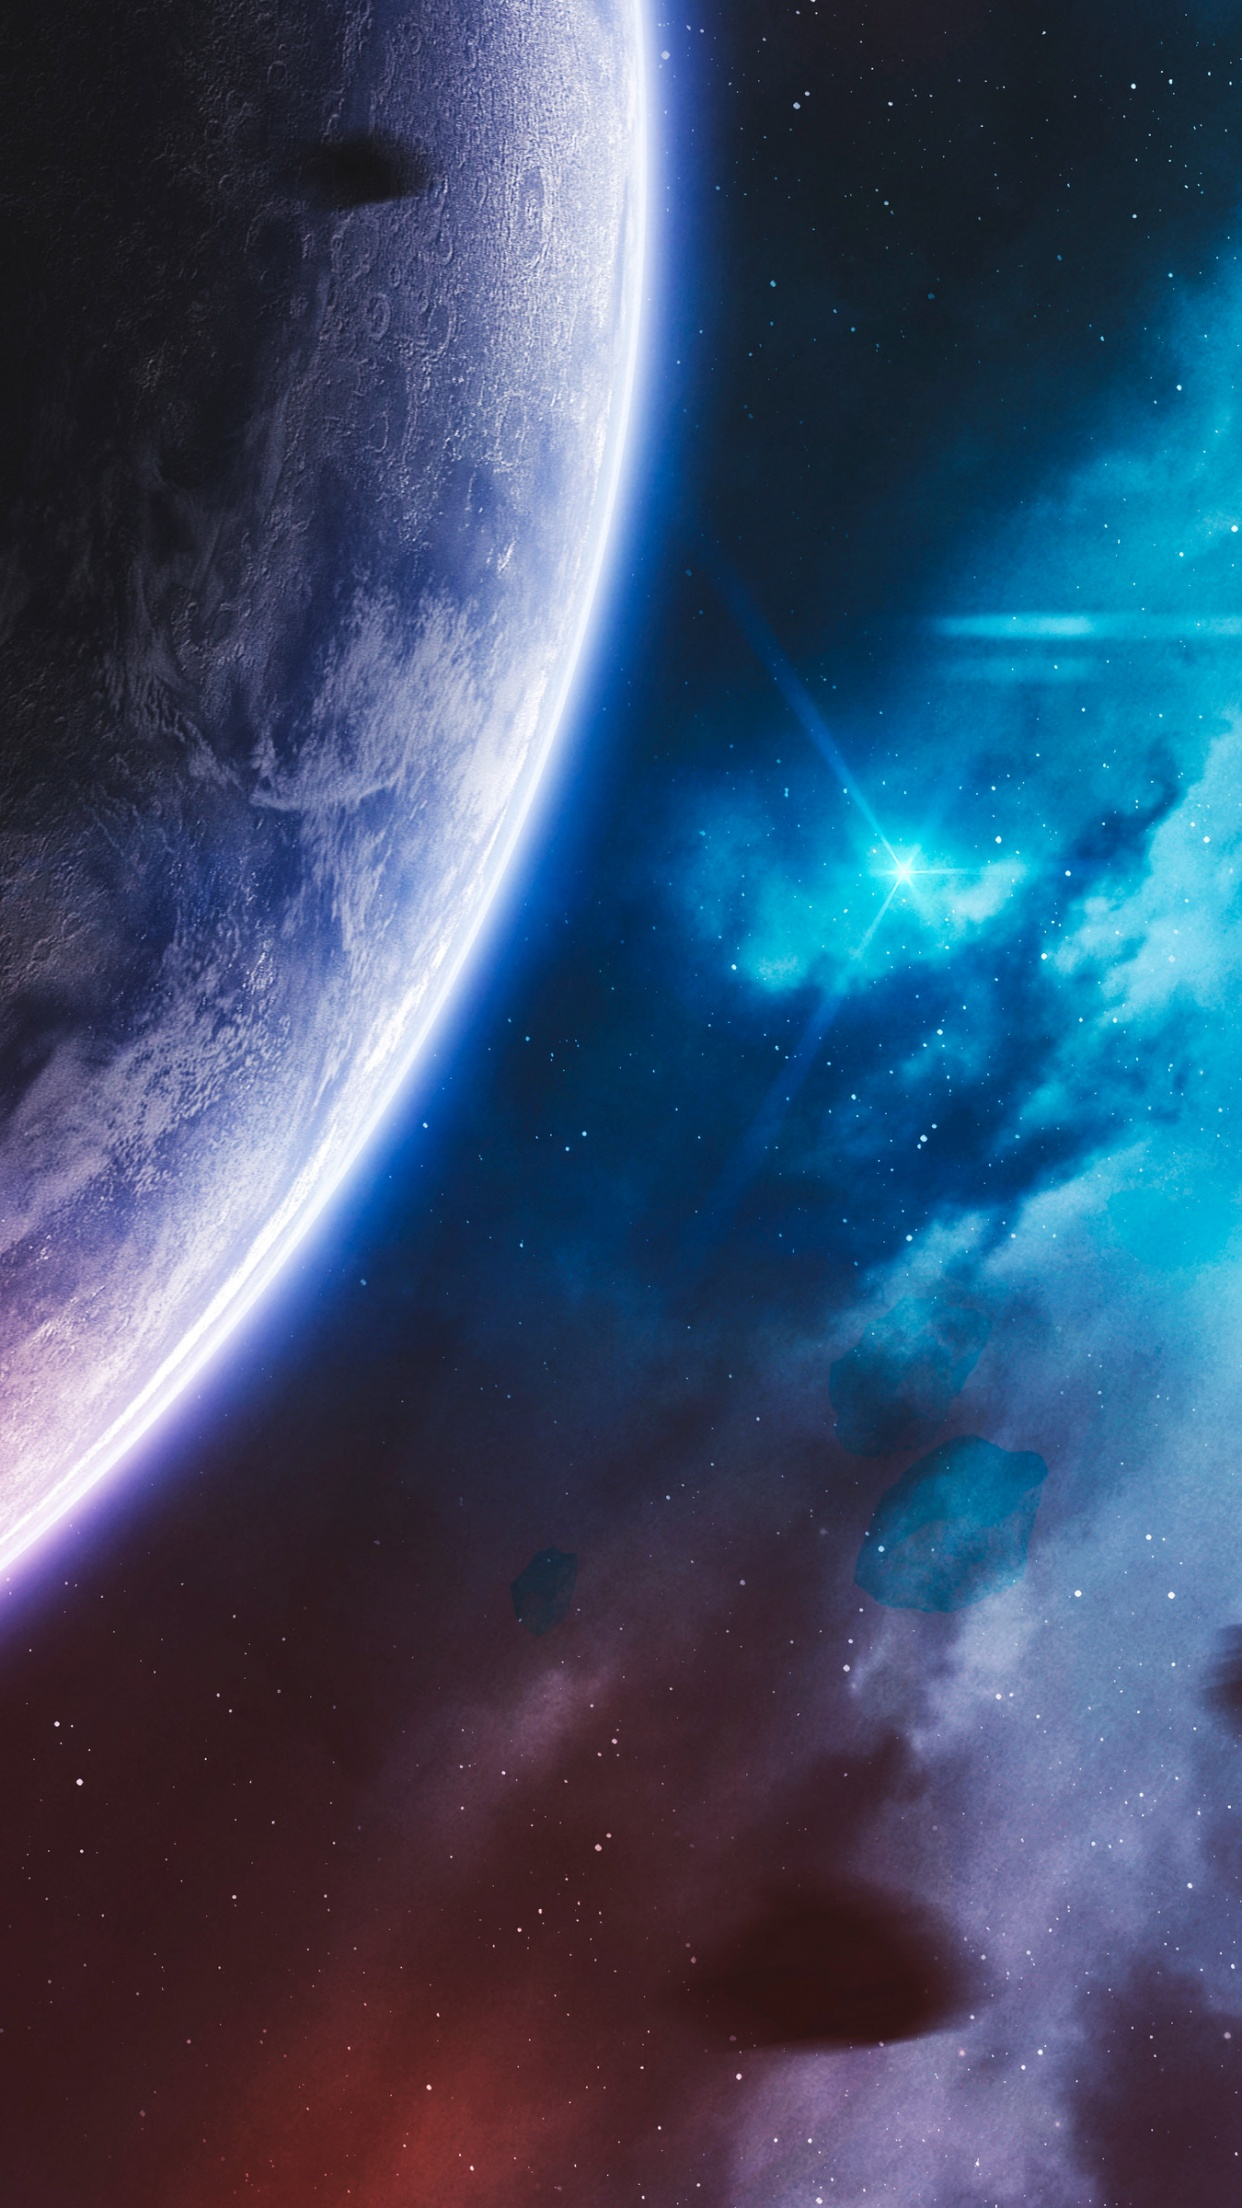 Purple Planet 4K Wallpaper Cosmos Stars Blue Galaxy